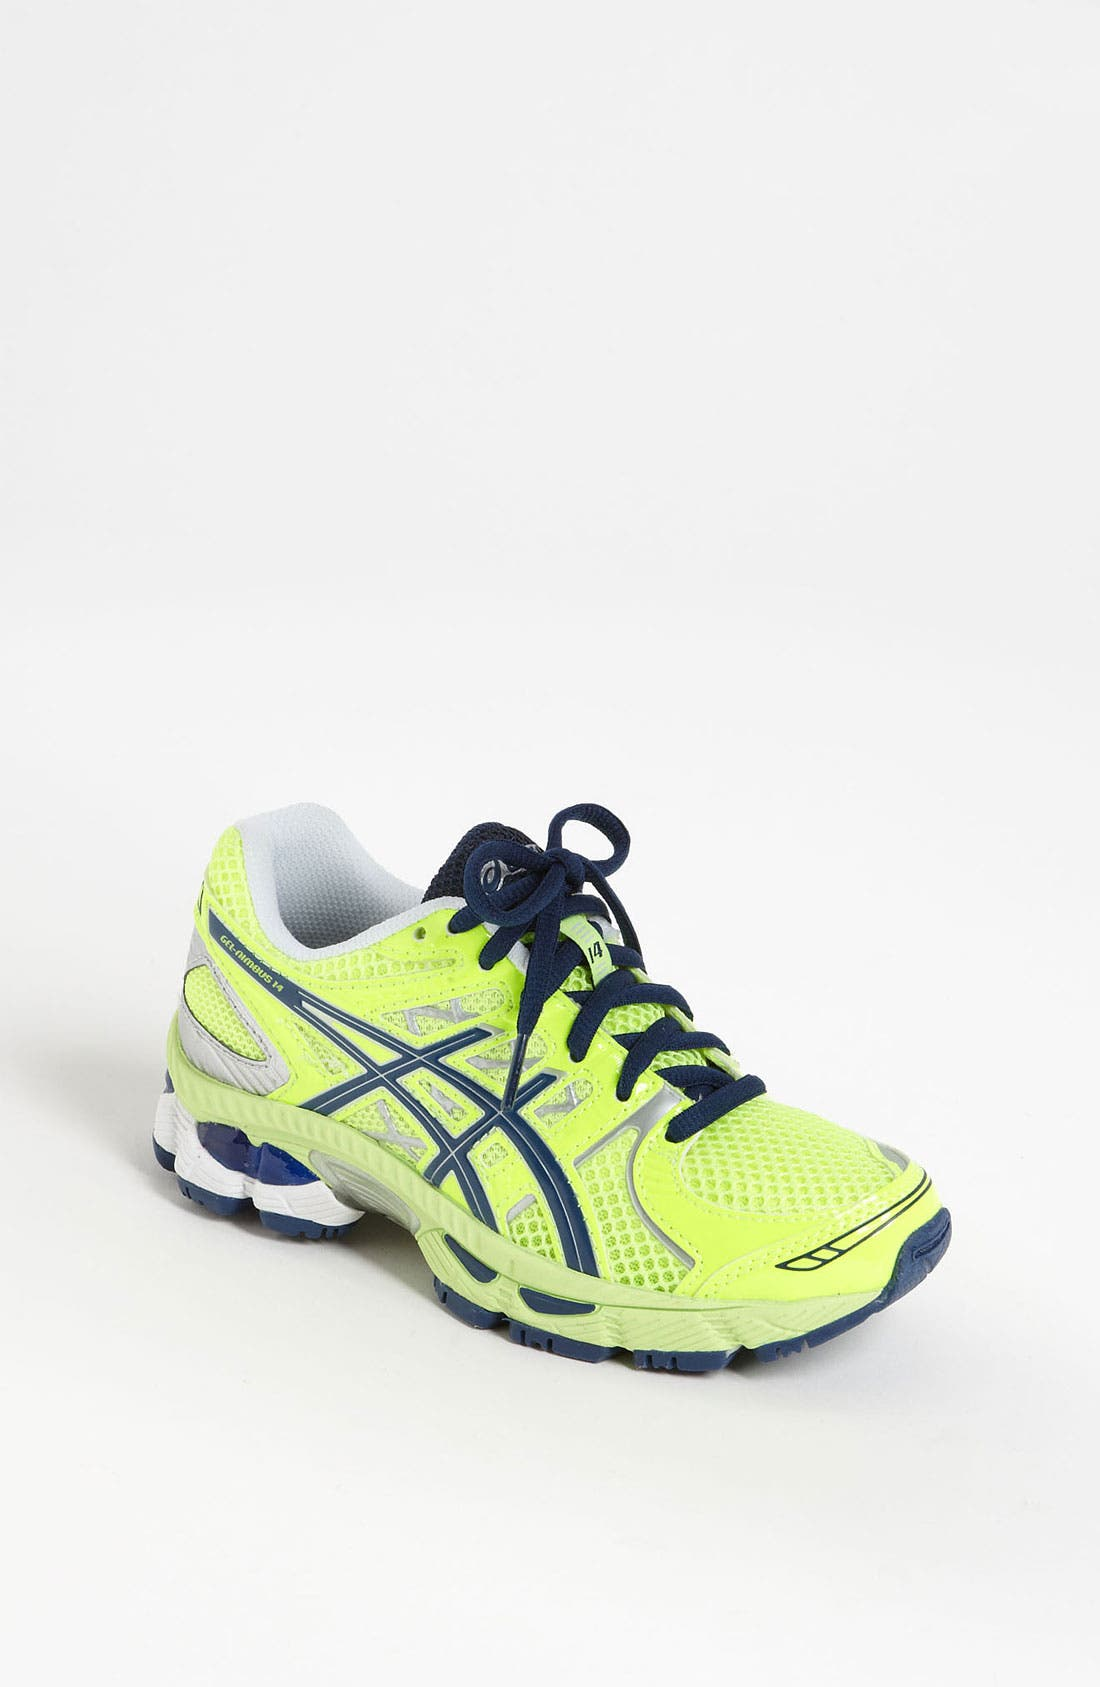 Main Image - ASICS® 'GEL®-Nimbus 14' Running Shoe (Little Kid & Big Kid)